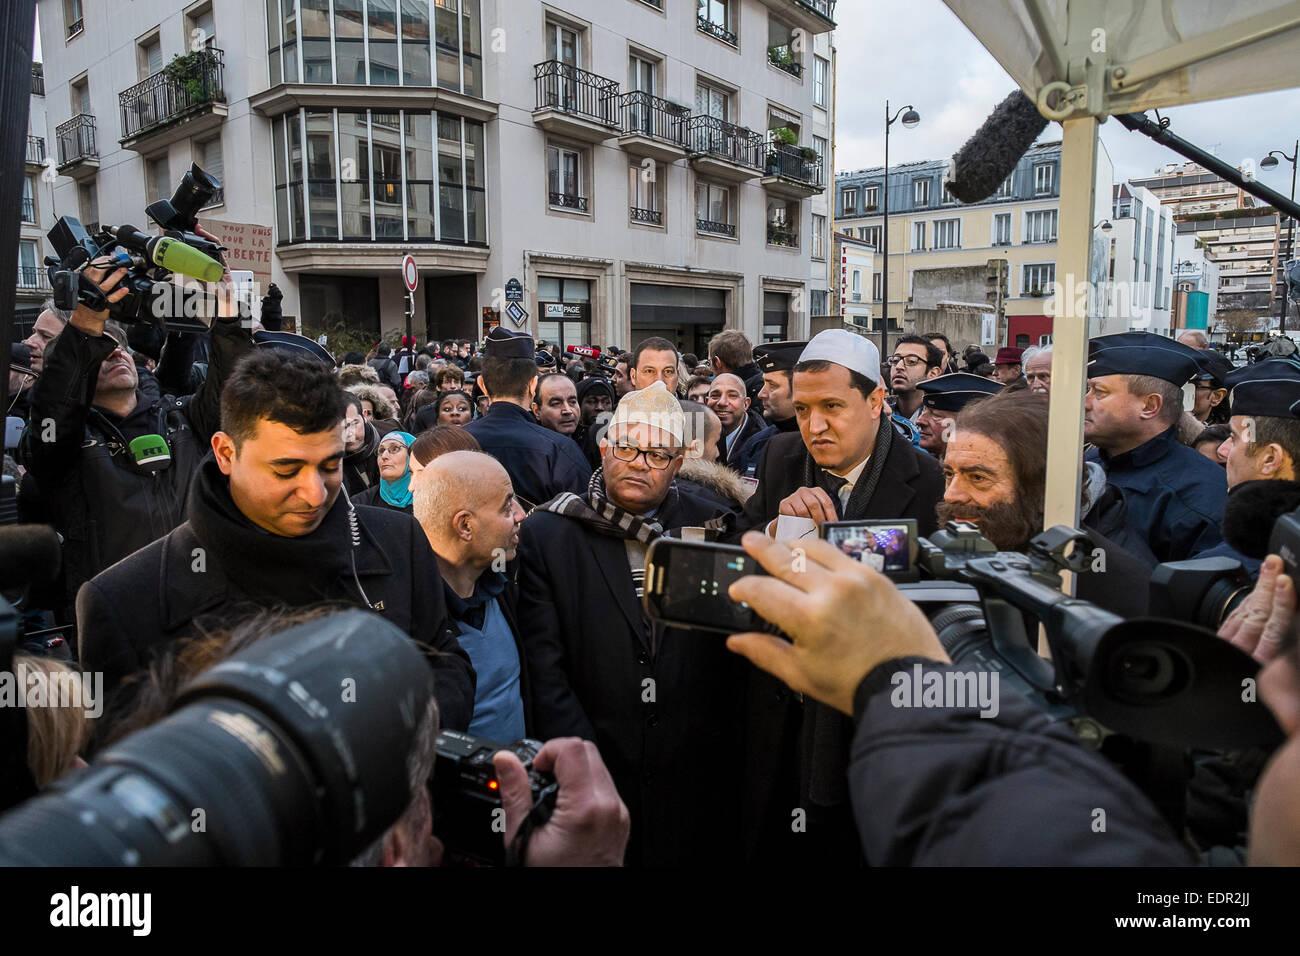 Paris, France. 8th Jan, 2015. Hassen Chalghoumi, imam of Drancy mosque (white hat) and Marek Halter, Jewish writer, Stock Photo